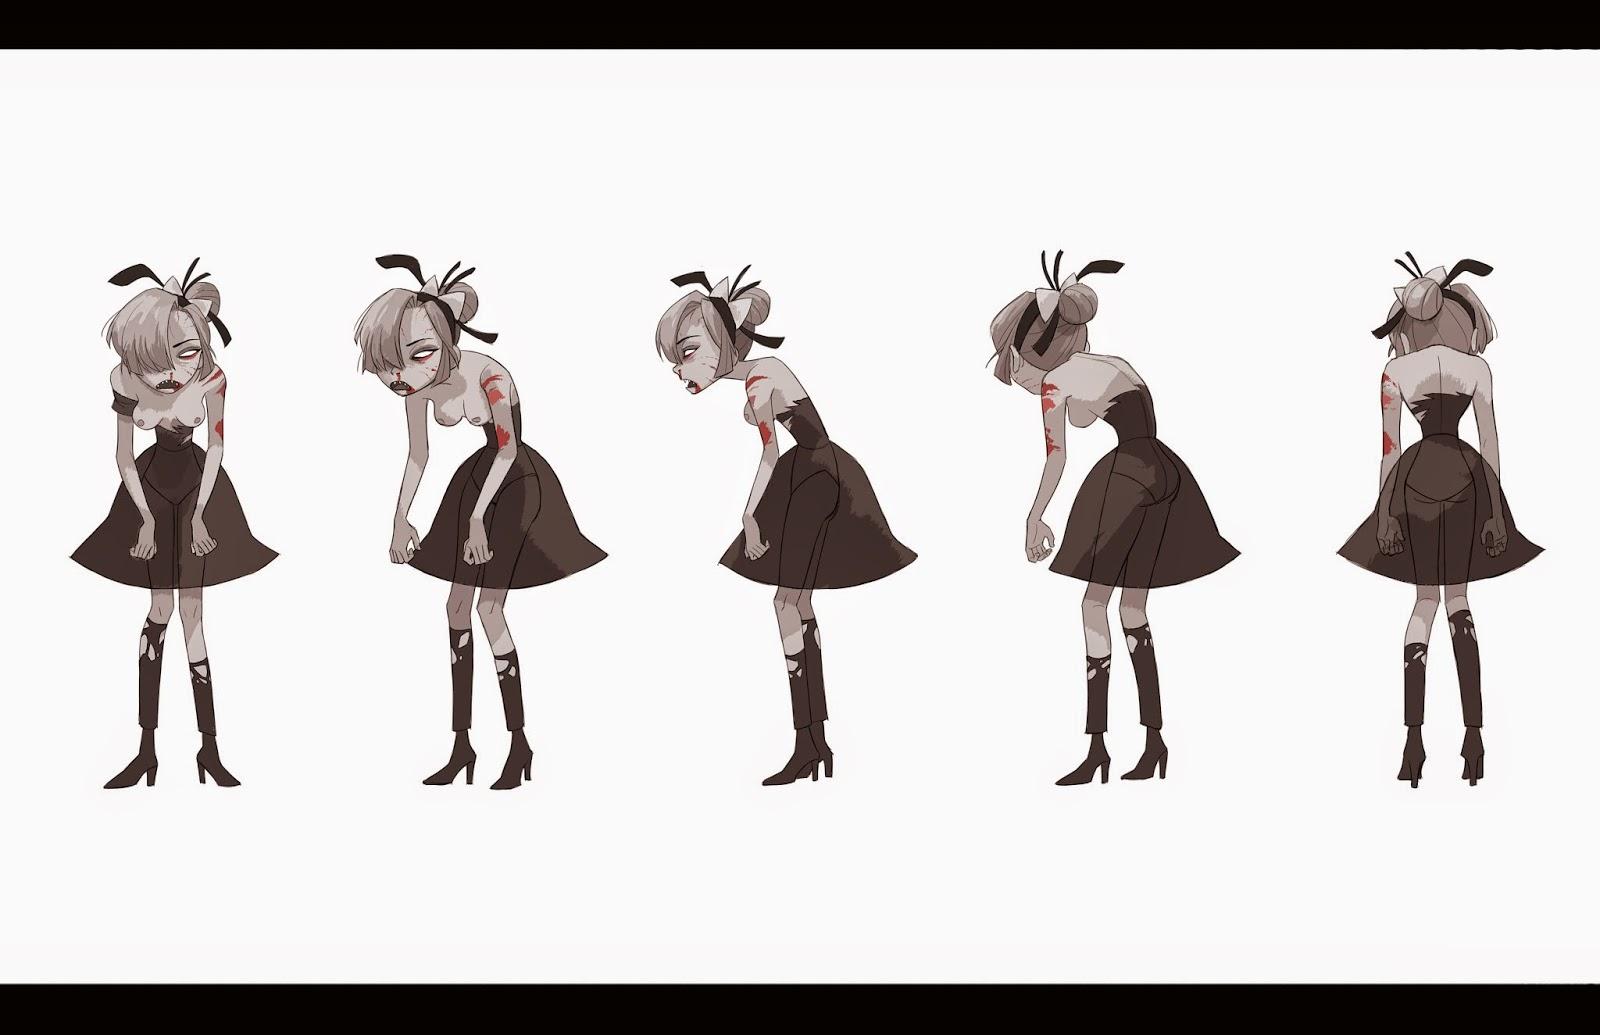 Calarts Character Design Portfolio : Mirae works yi character design portfolio